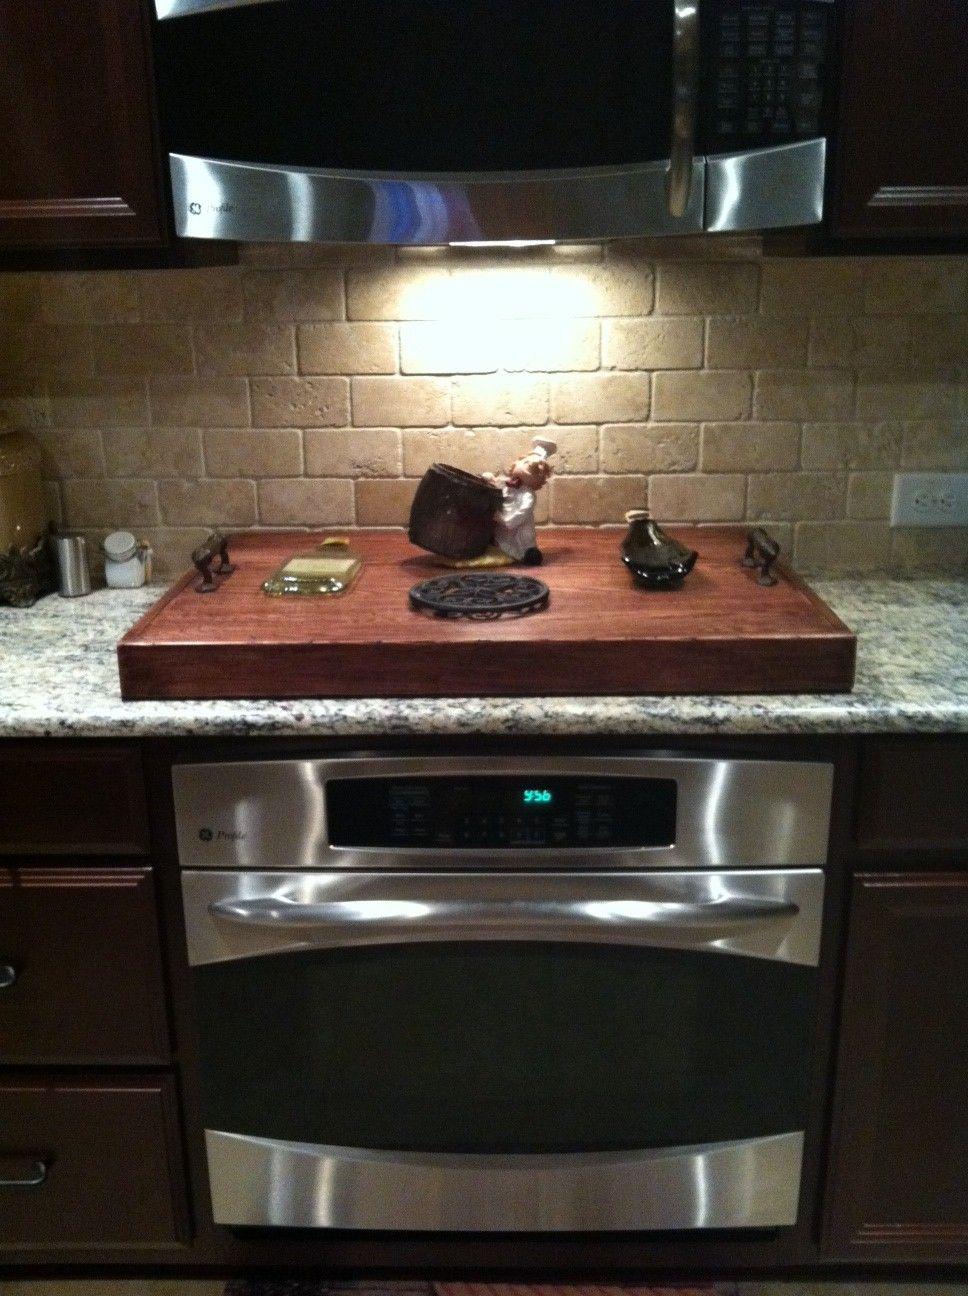 My stove top cover home tour pinterest - Stove backsplash protector ...